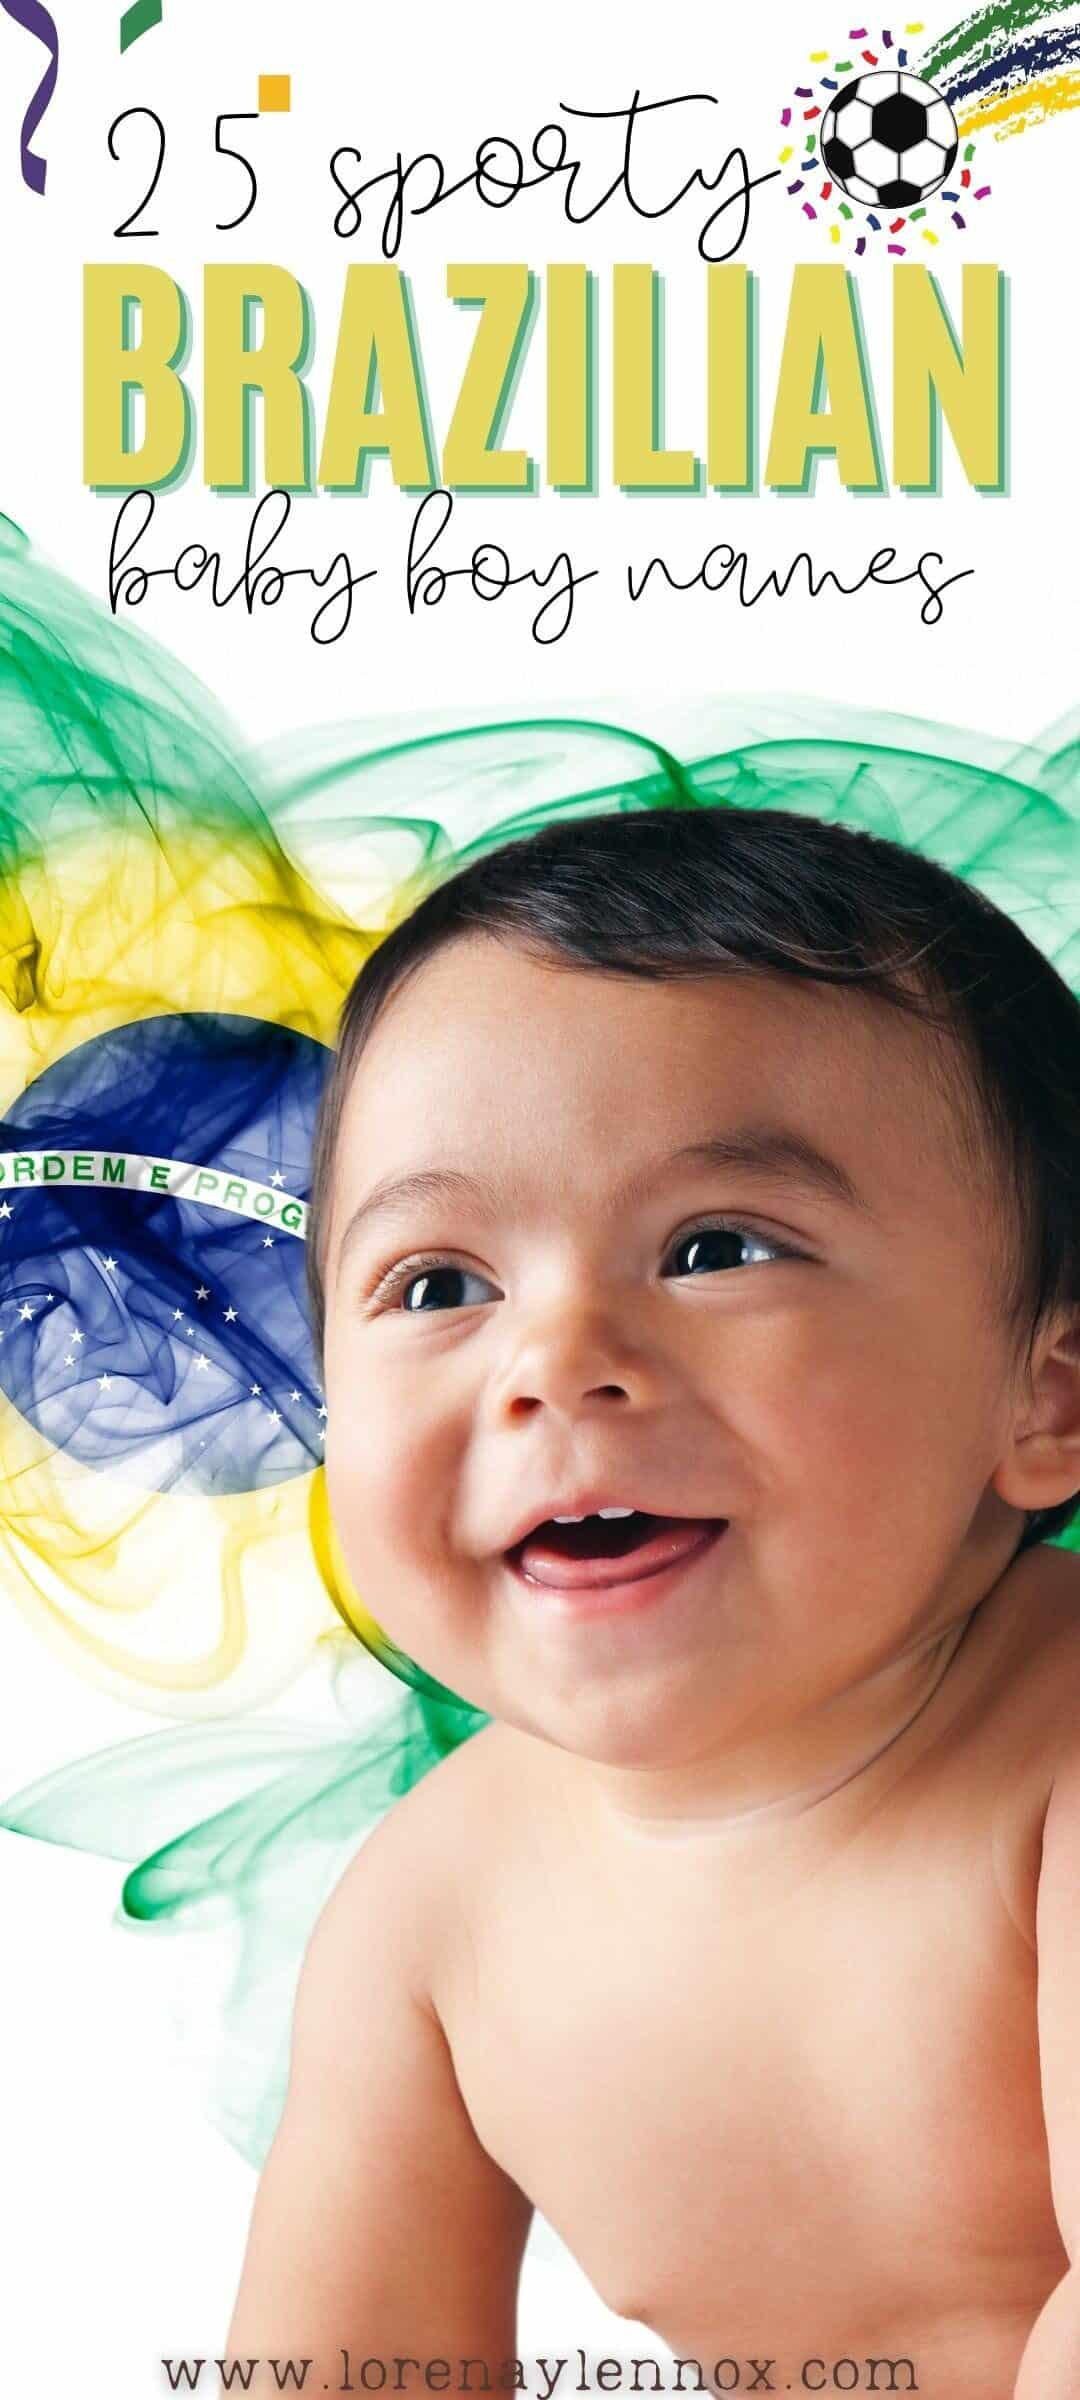 25 Unique Brazilian Baby Boy Names Inspired by Famous Brazilian Soccer Players #babyboynames #Brazilianbabynames #brazilianbabyboynames #Uniquebabyboynames #uncommonbabyboynames